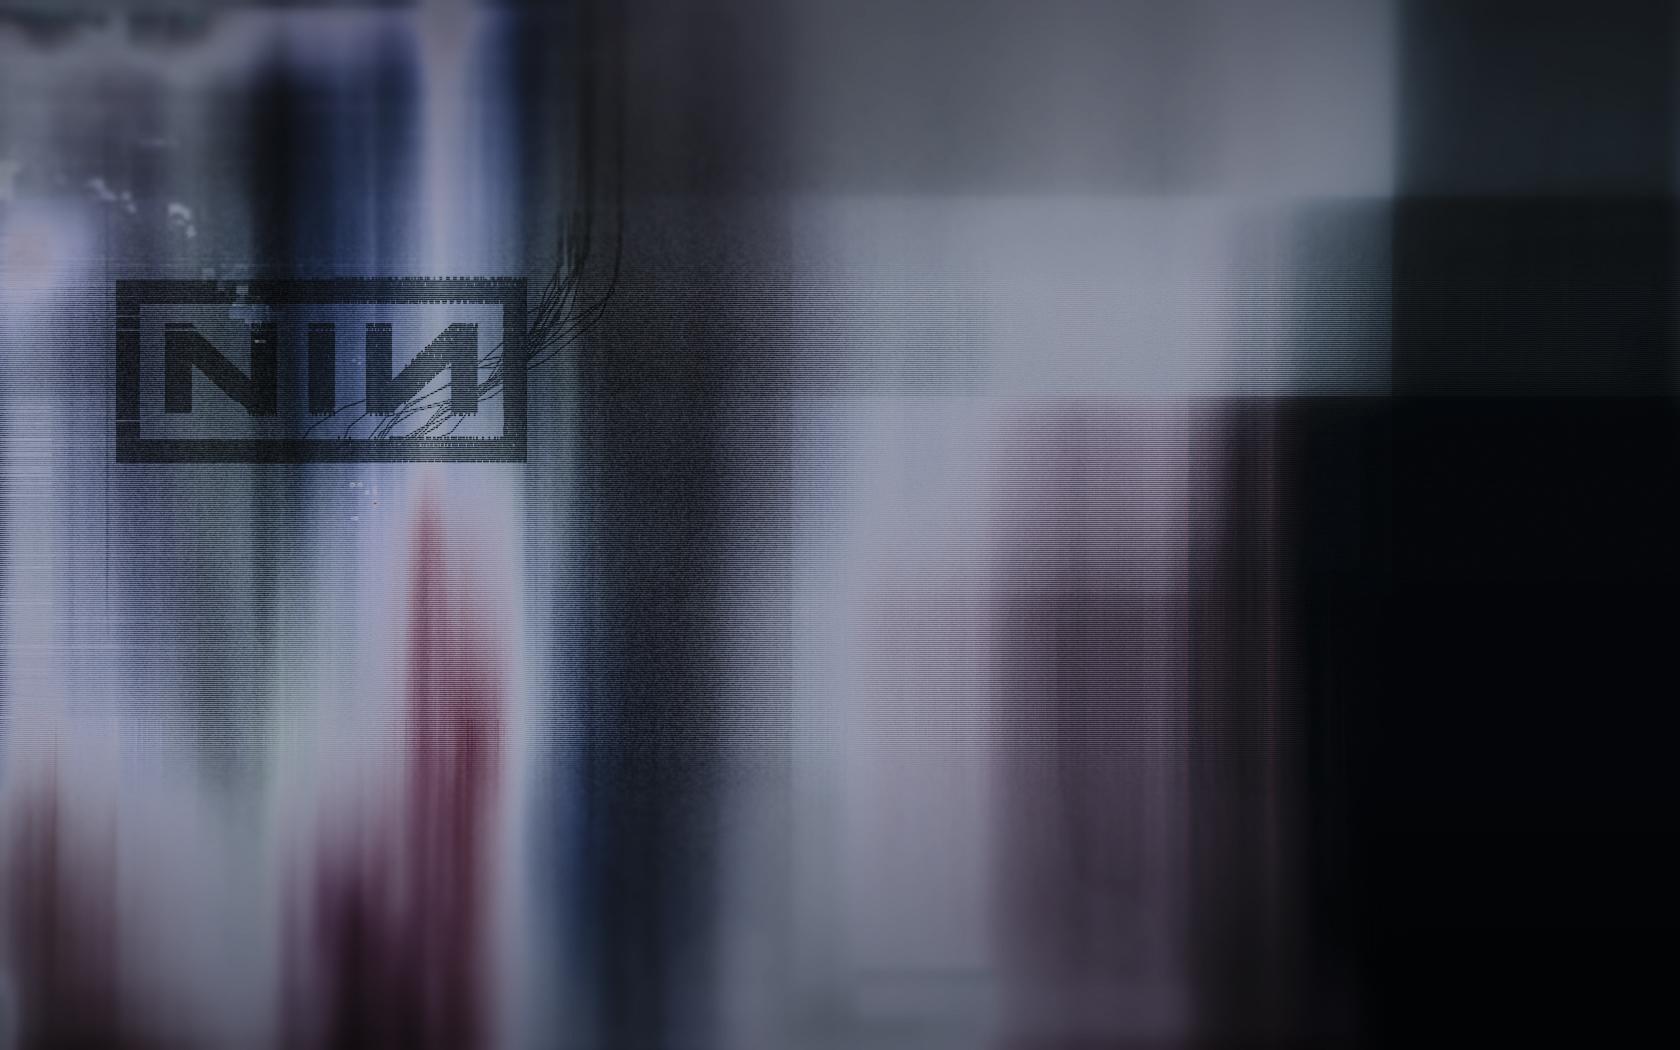 Free Download Nine Inch Nails Nine Inch Nails Wallpaper 10561118